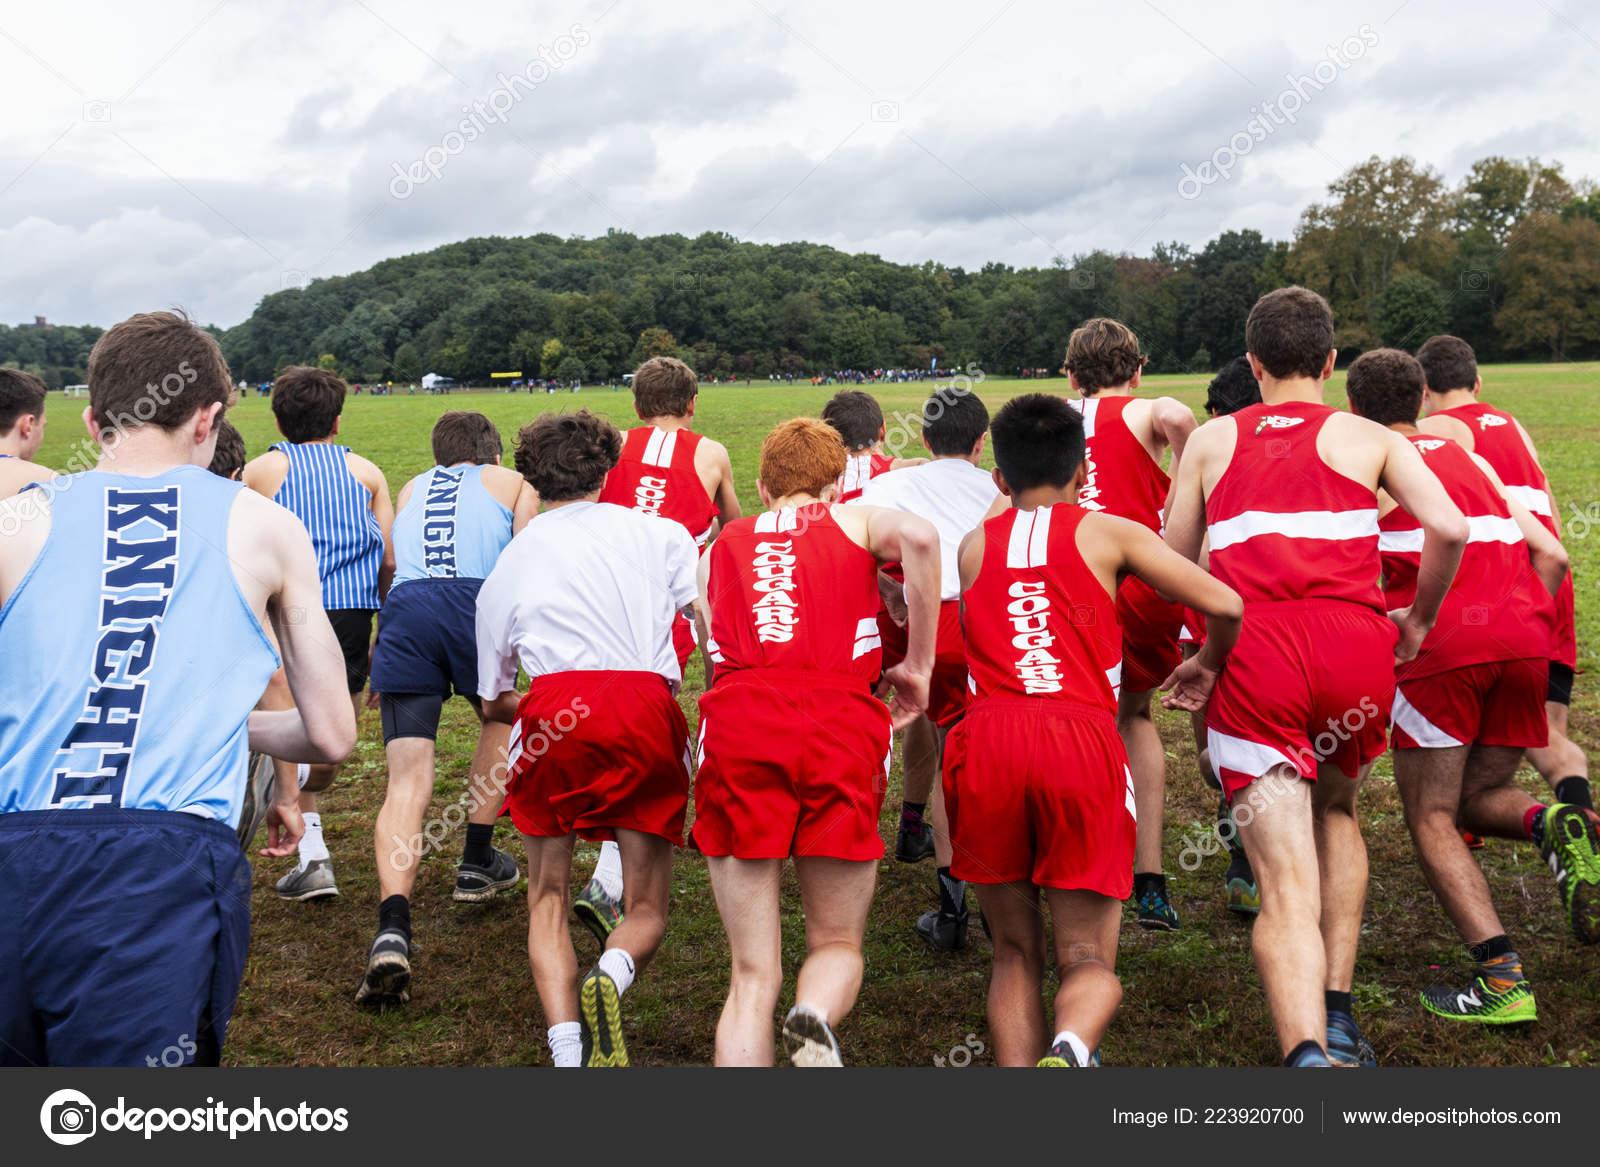 bronx new yotk usa october 2018 high school boys starting stock